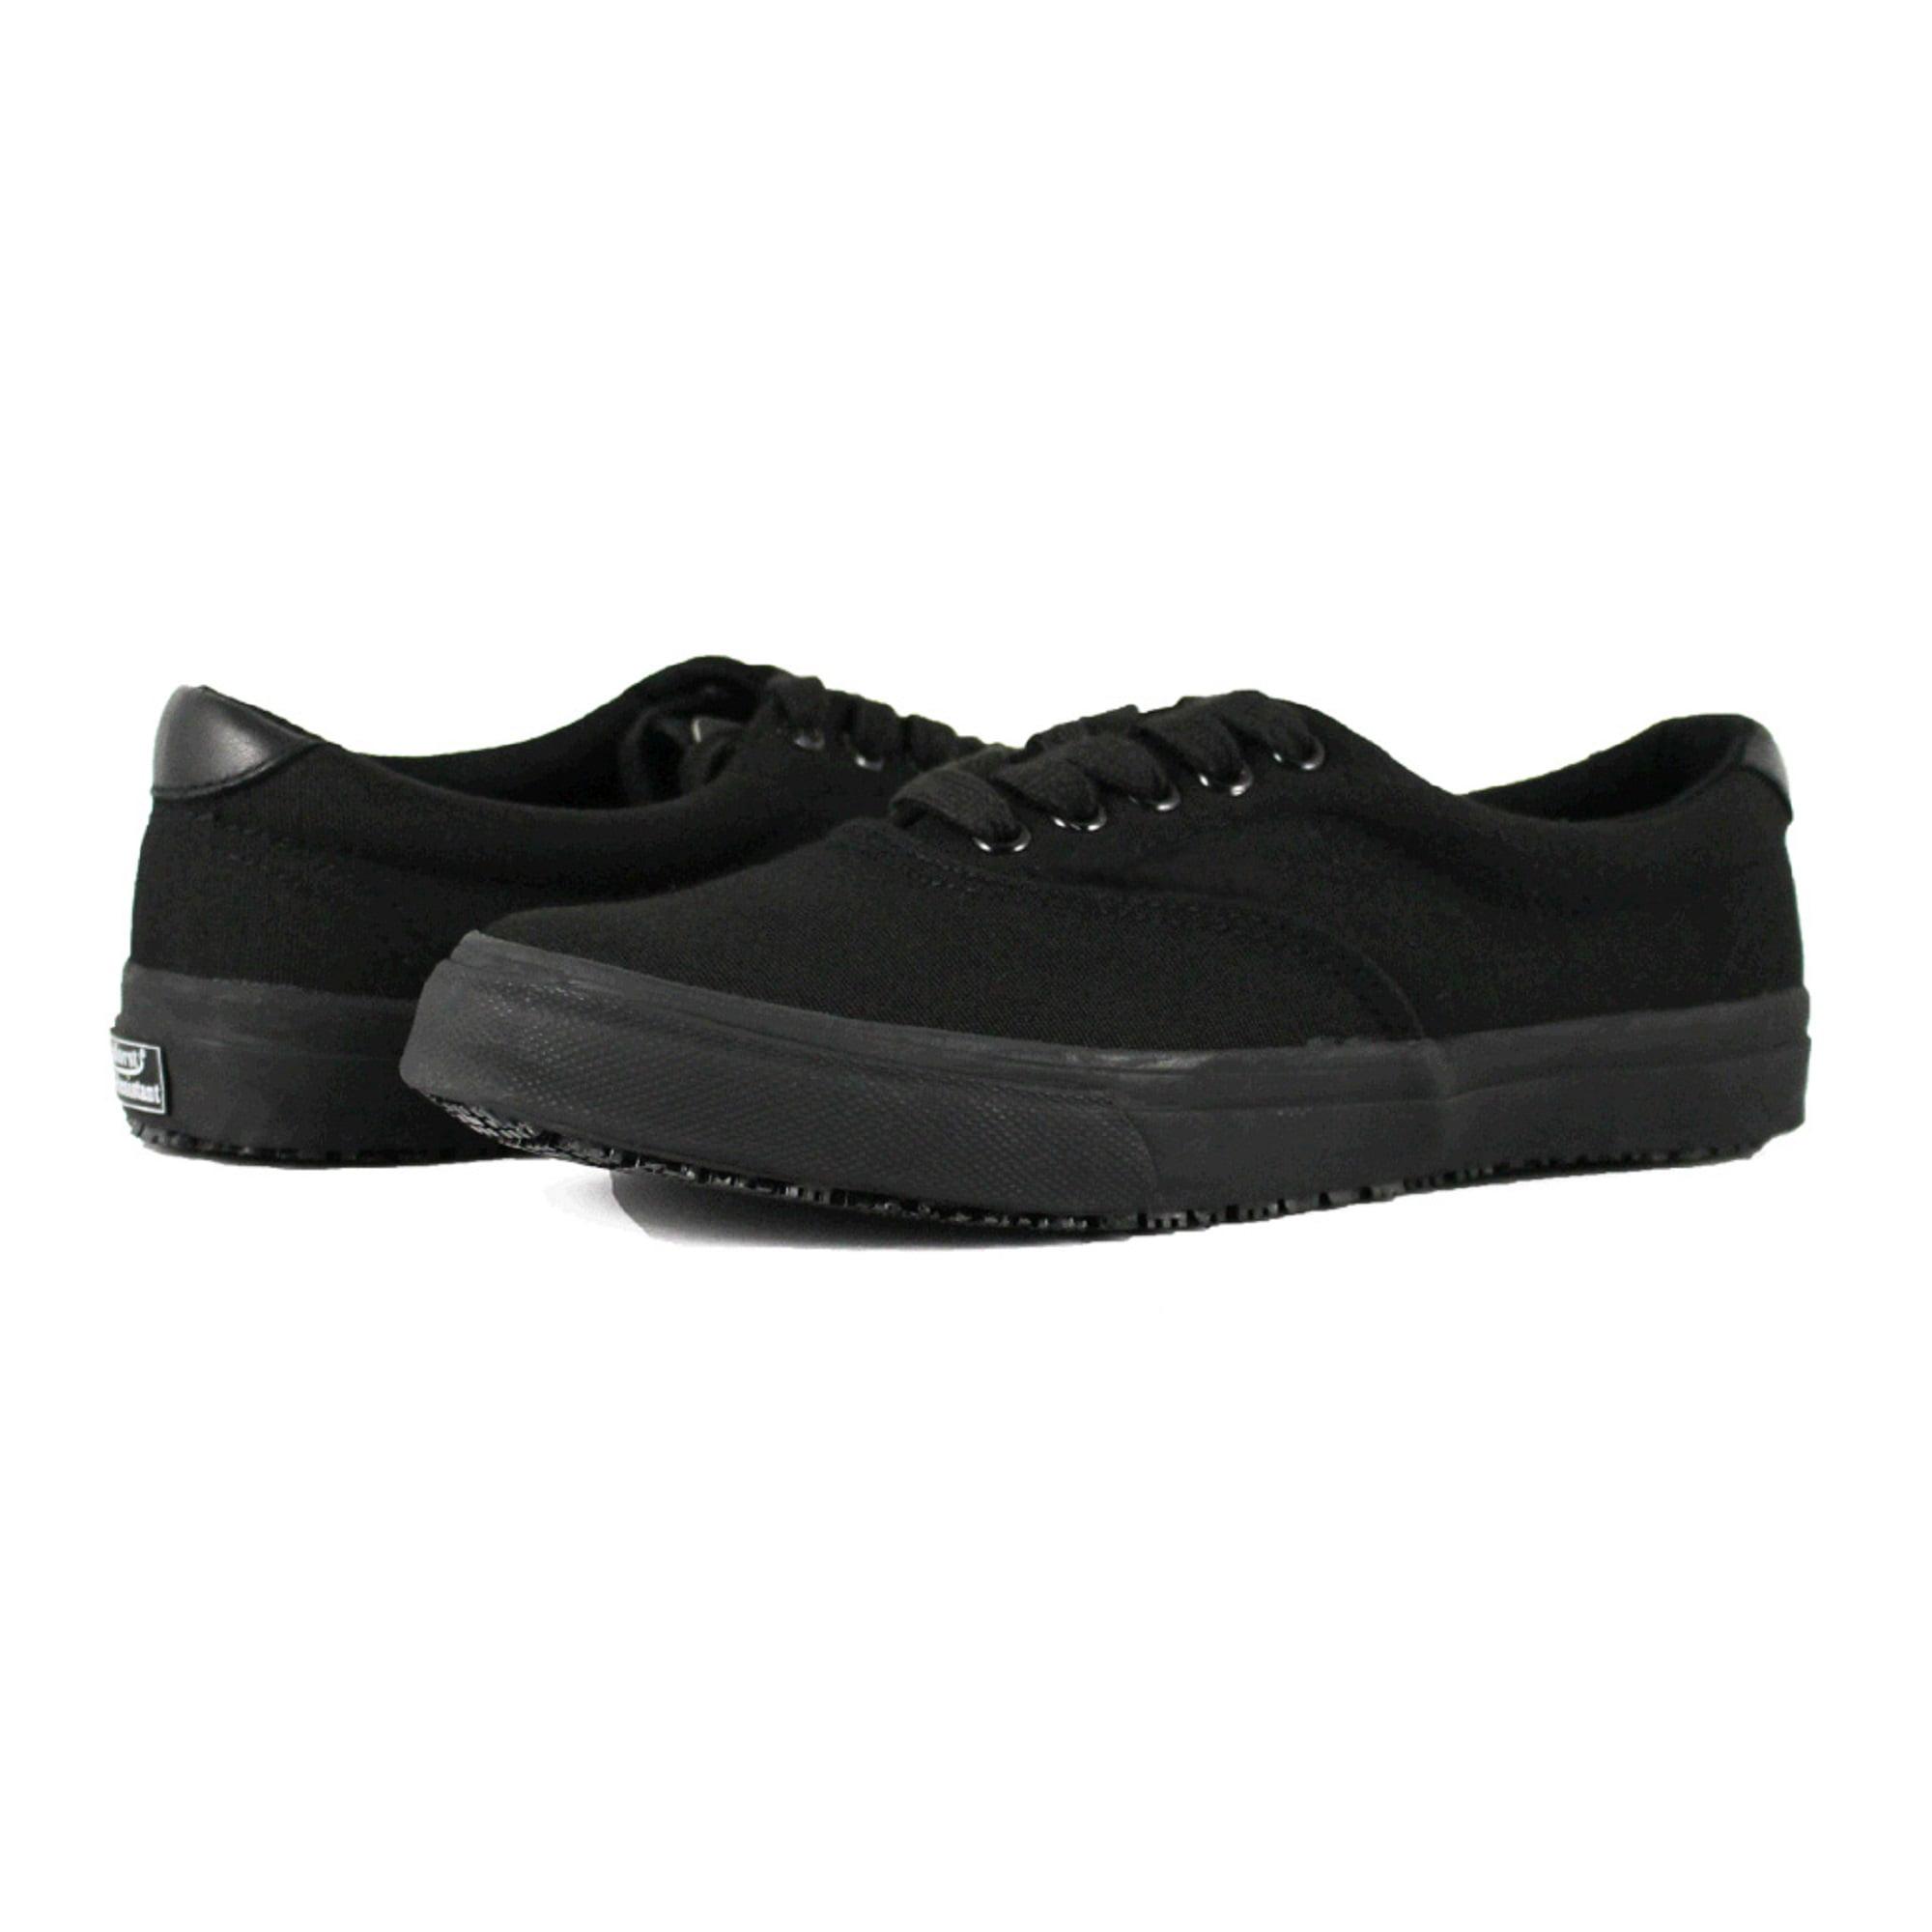 slip grip shoes walmart